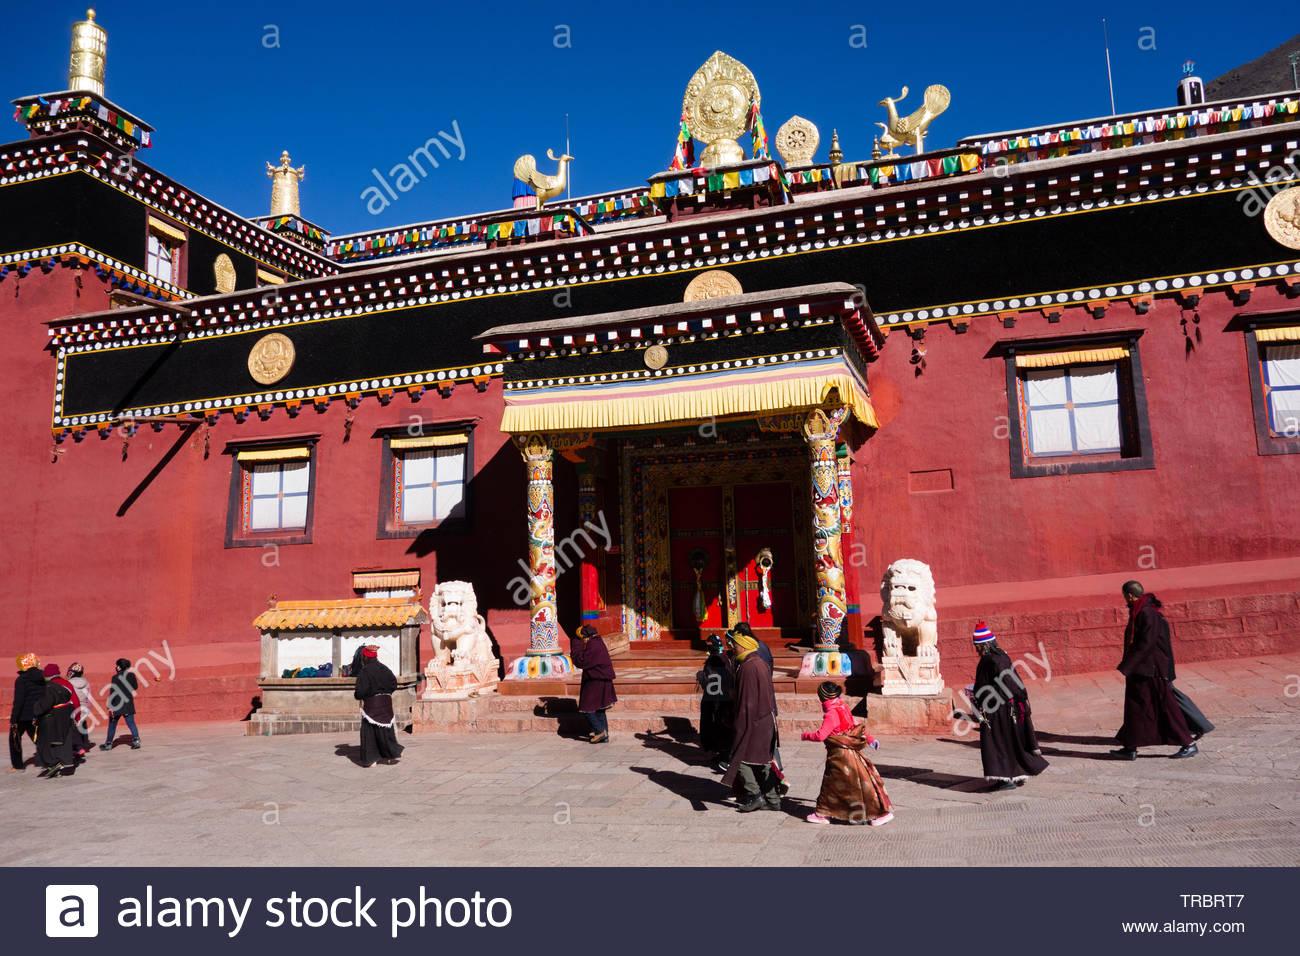 Tibetan pilgrims walk around Bakong Monastery, Dege, Sichuan, China - Stock Image